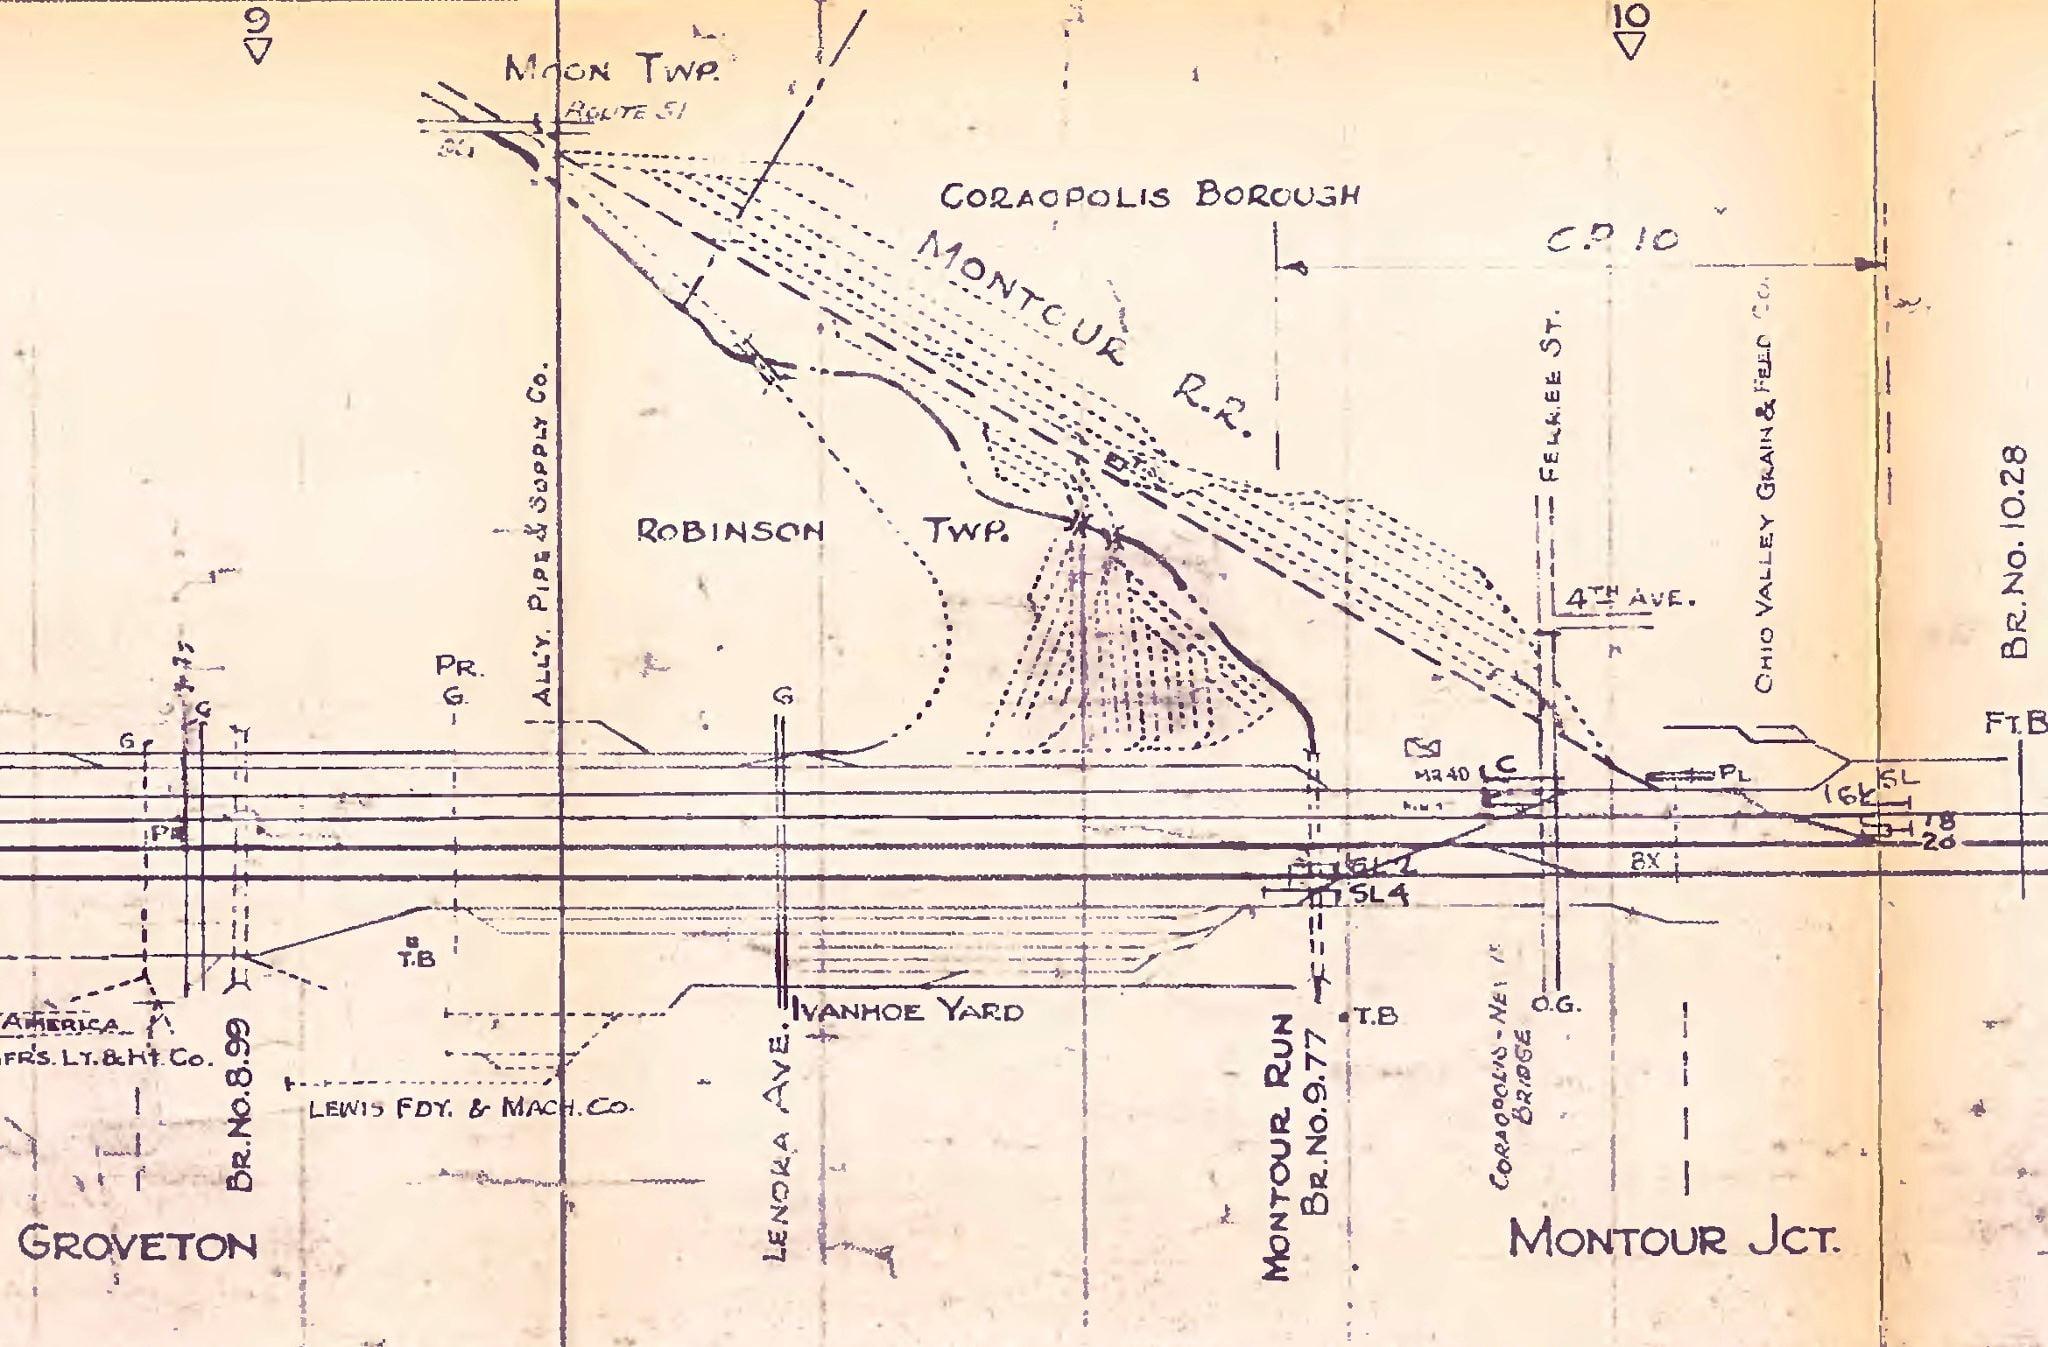 P&LE track diagram showing the interchange with Montour.jpg